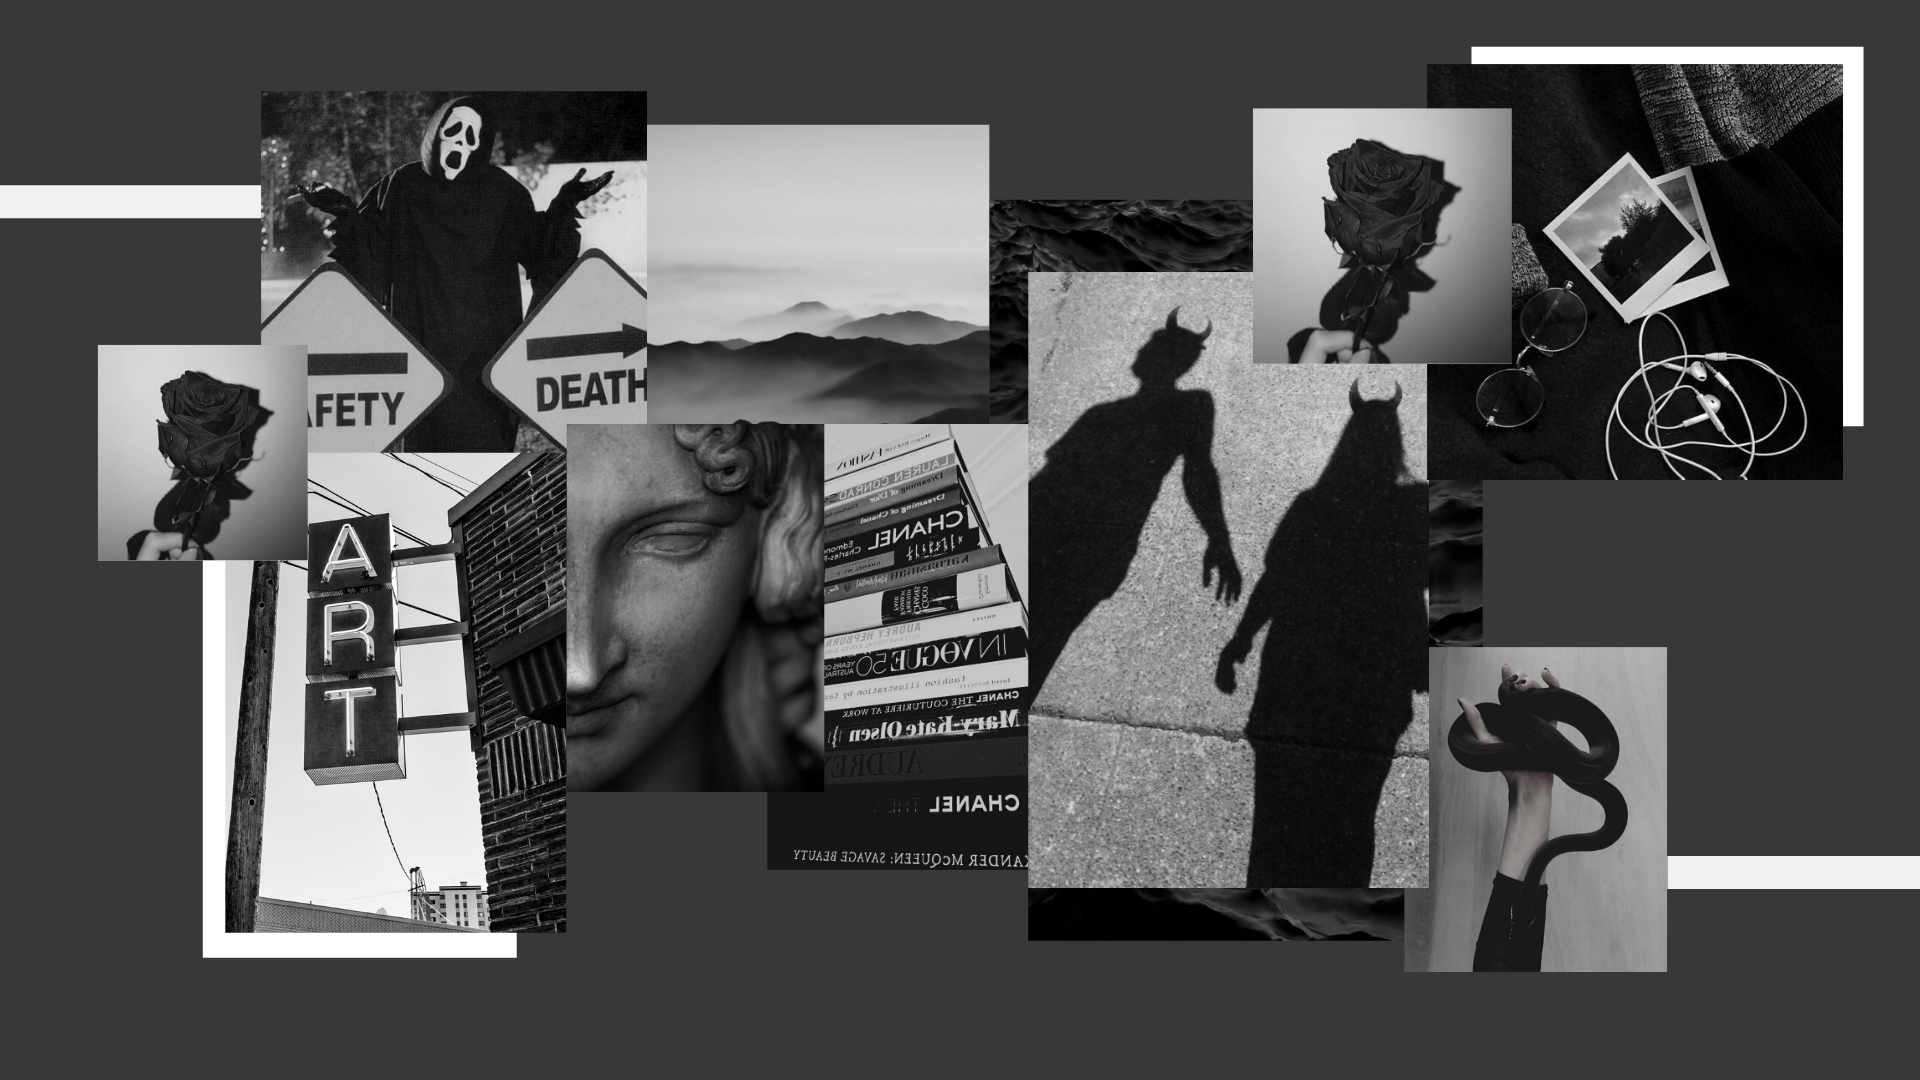 Dark Wallpaper En 2020 Fondos Para Computadora Fondos Para Pc Tumblr Fondos De Computadora